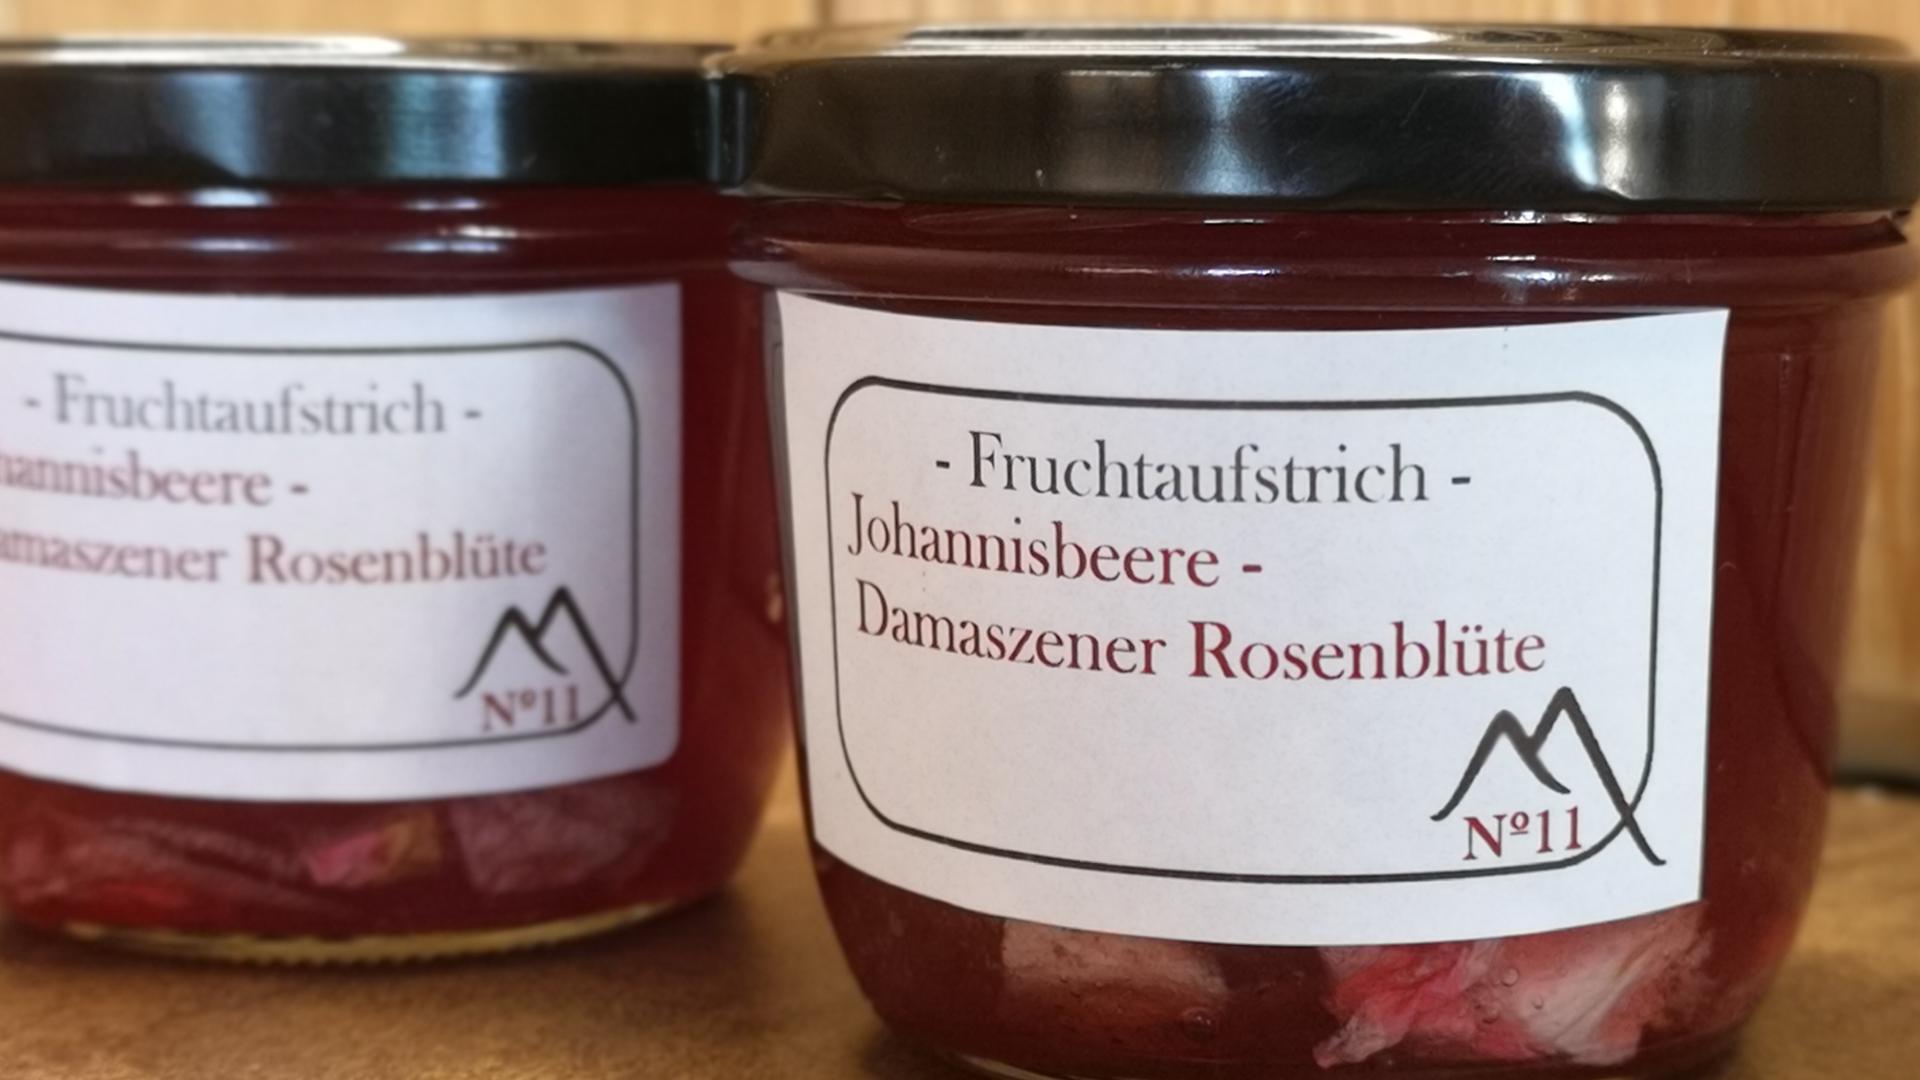 Johannisbeere - Damaszener Rosenblüte No. 11